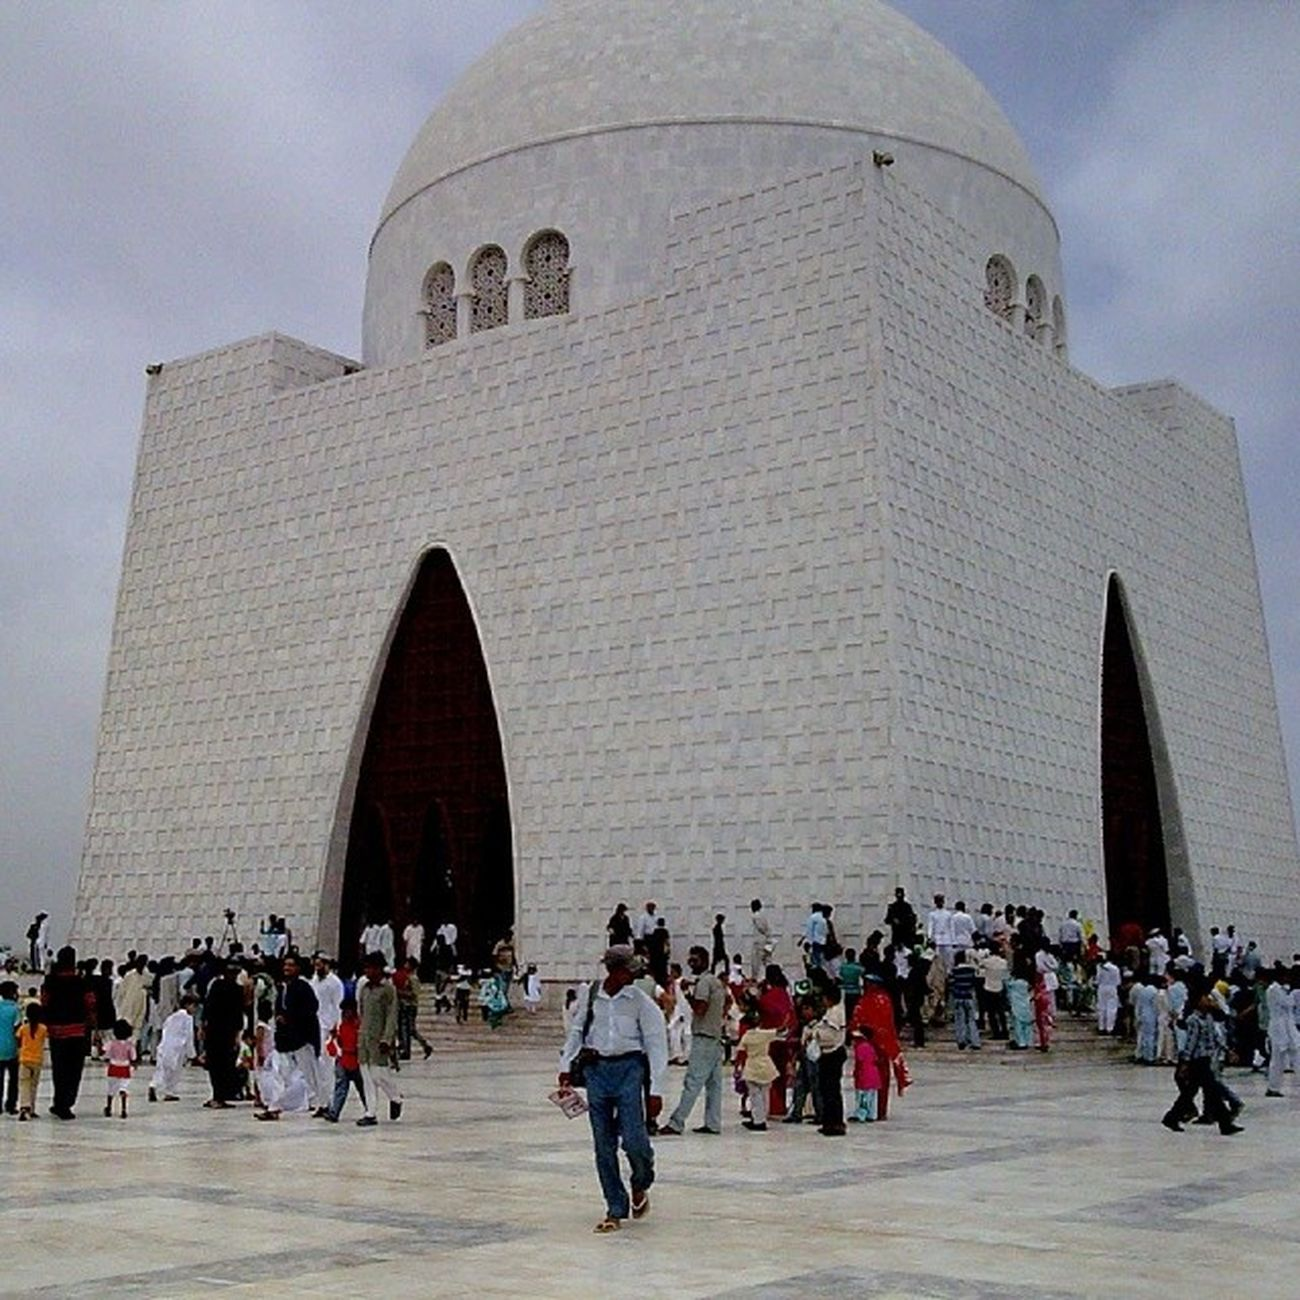 Quaid -e-azam'sTomb At 14 augsnaptakenfewyearsback